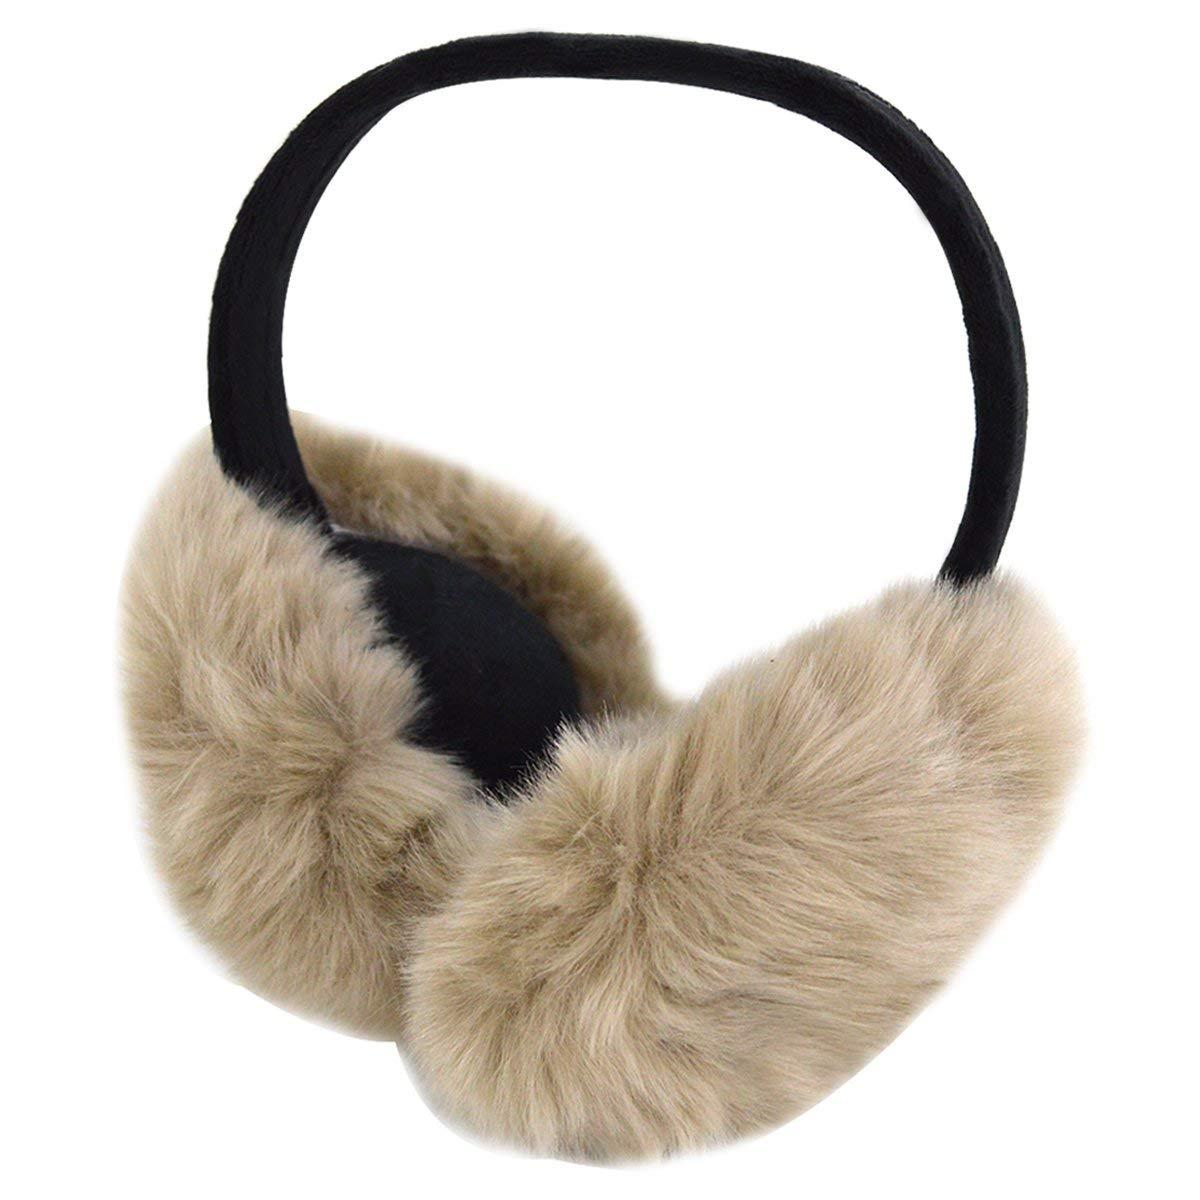 Kennedy Unisex Adult Winter Warm EarMuffs Can Folding And Washable Outdoor EarMuffs Faux Fur Ear Warmers Earmuffs